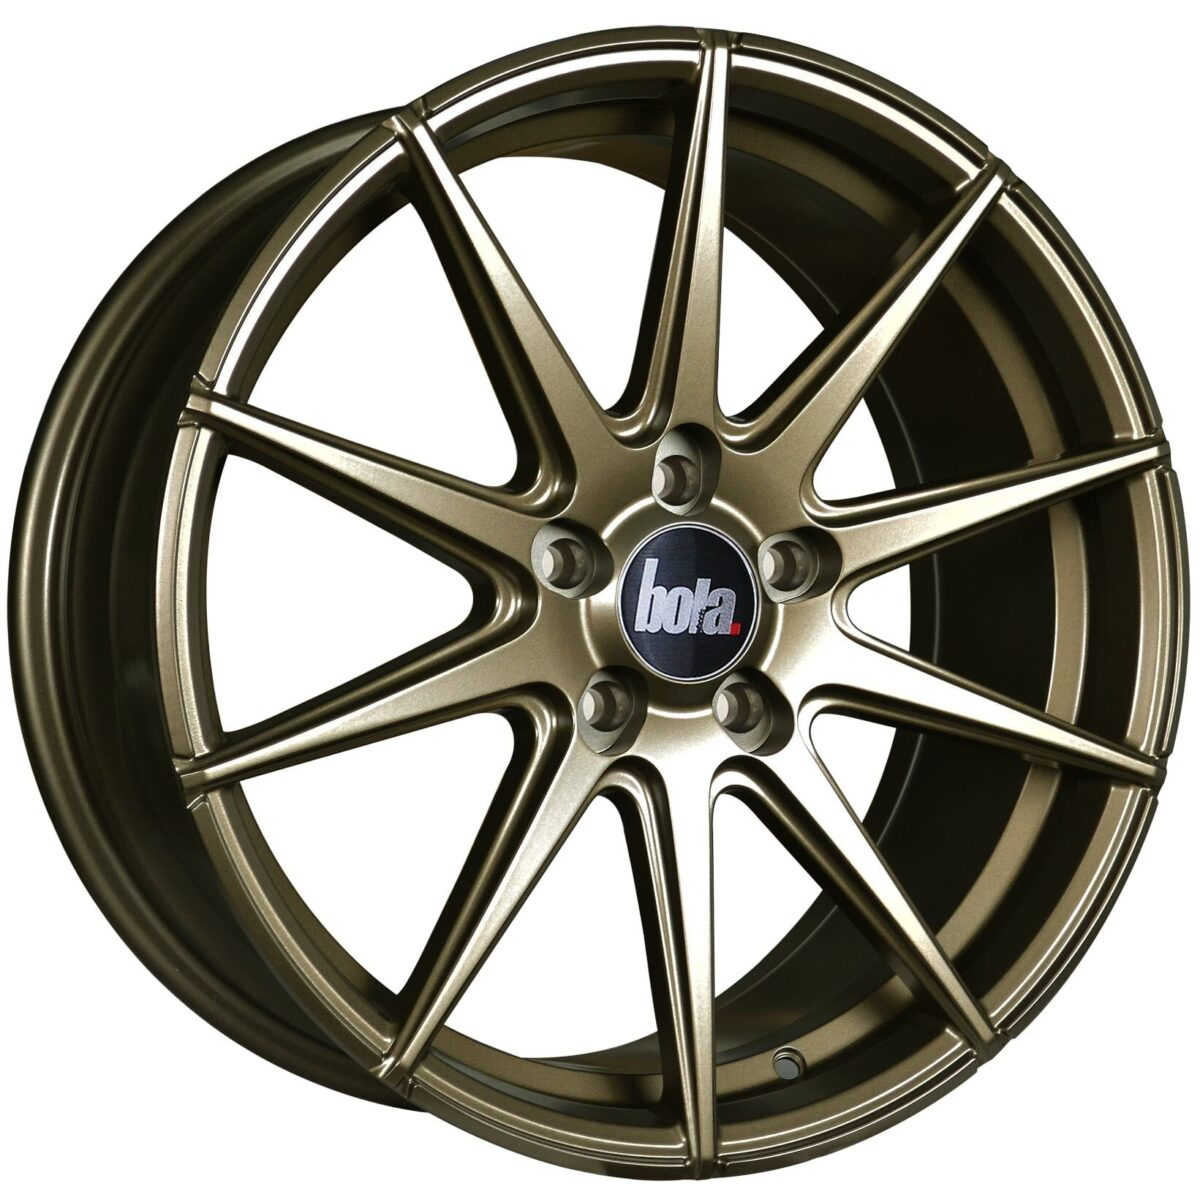 "18"" BOLA CSR Wheels - Matt Bronze - VW / Audi / Mercedes - 5x112"